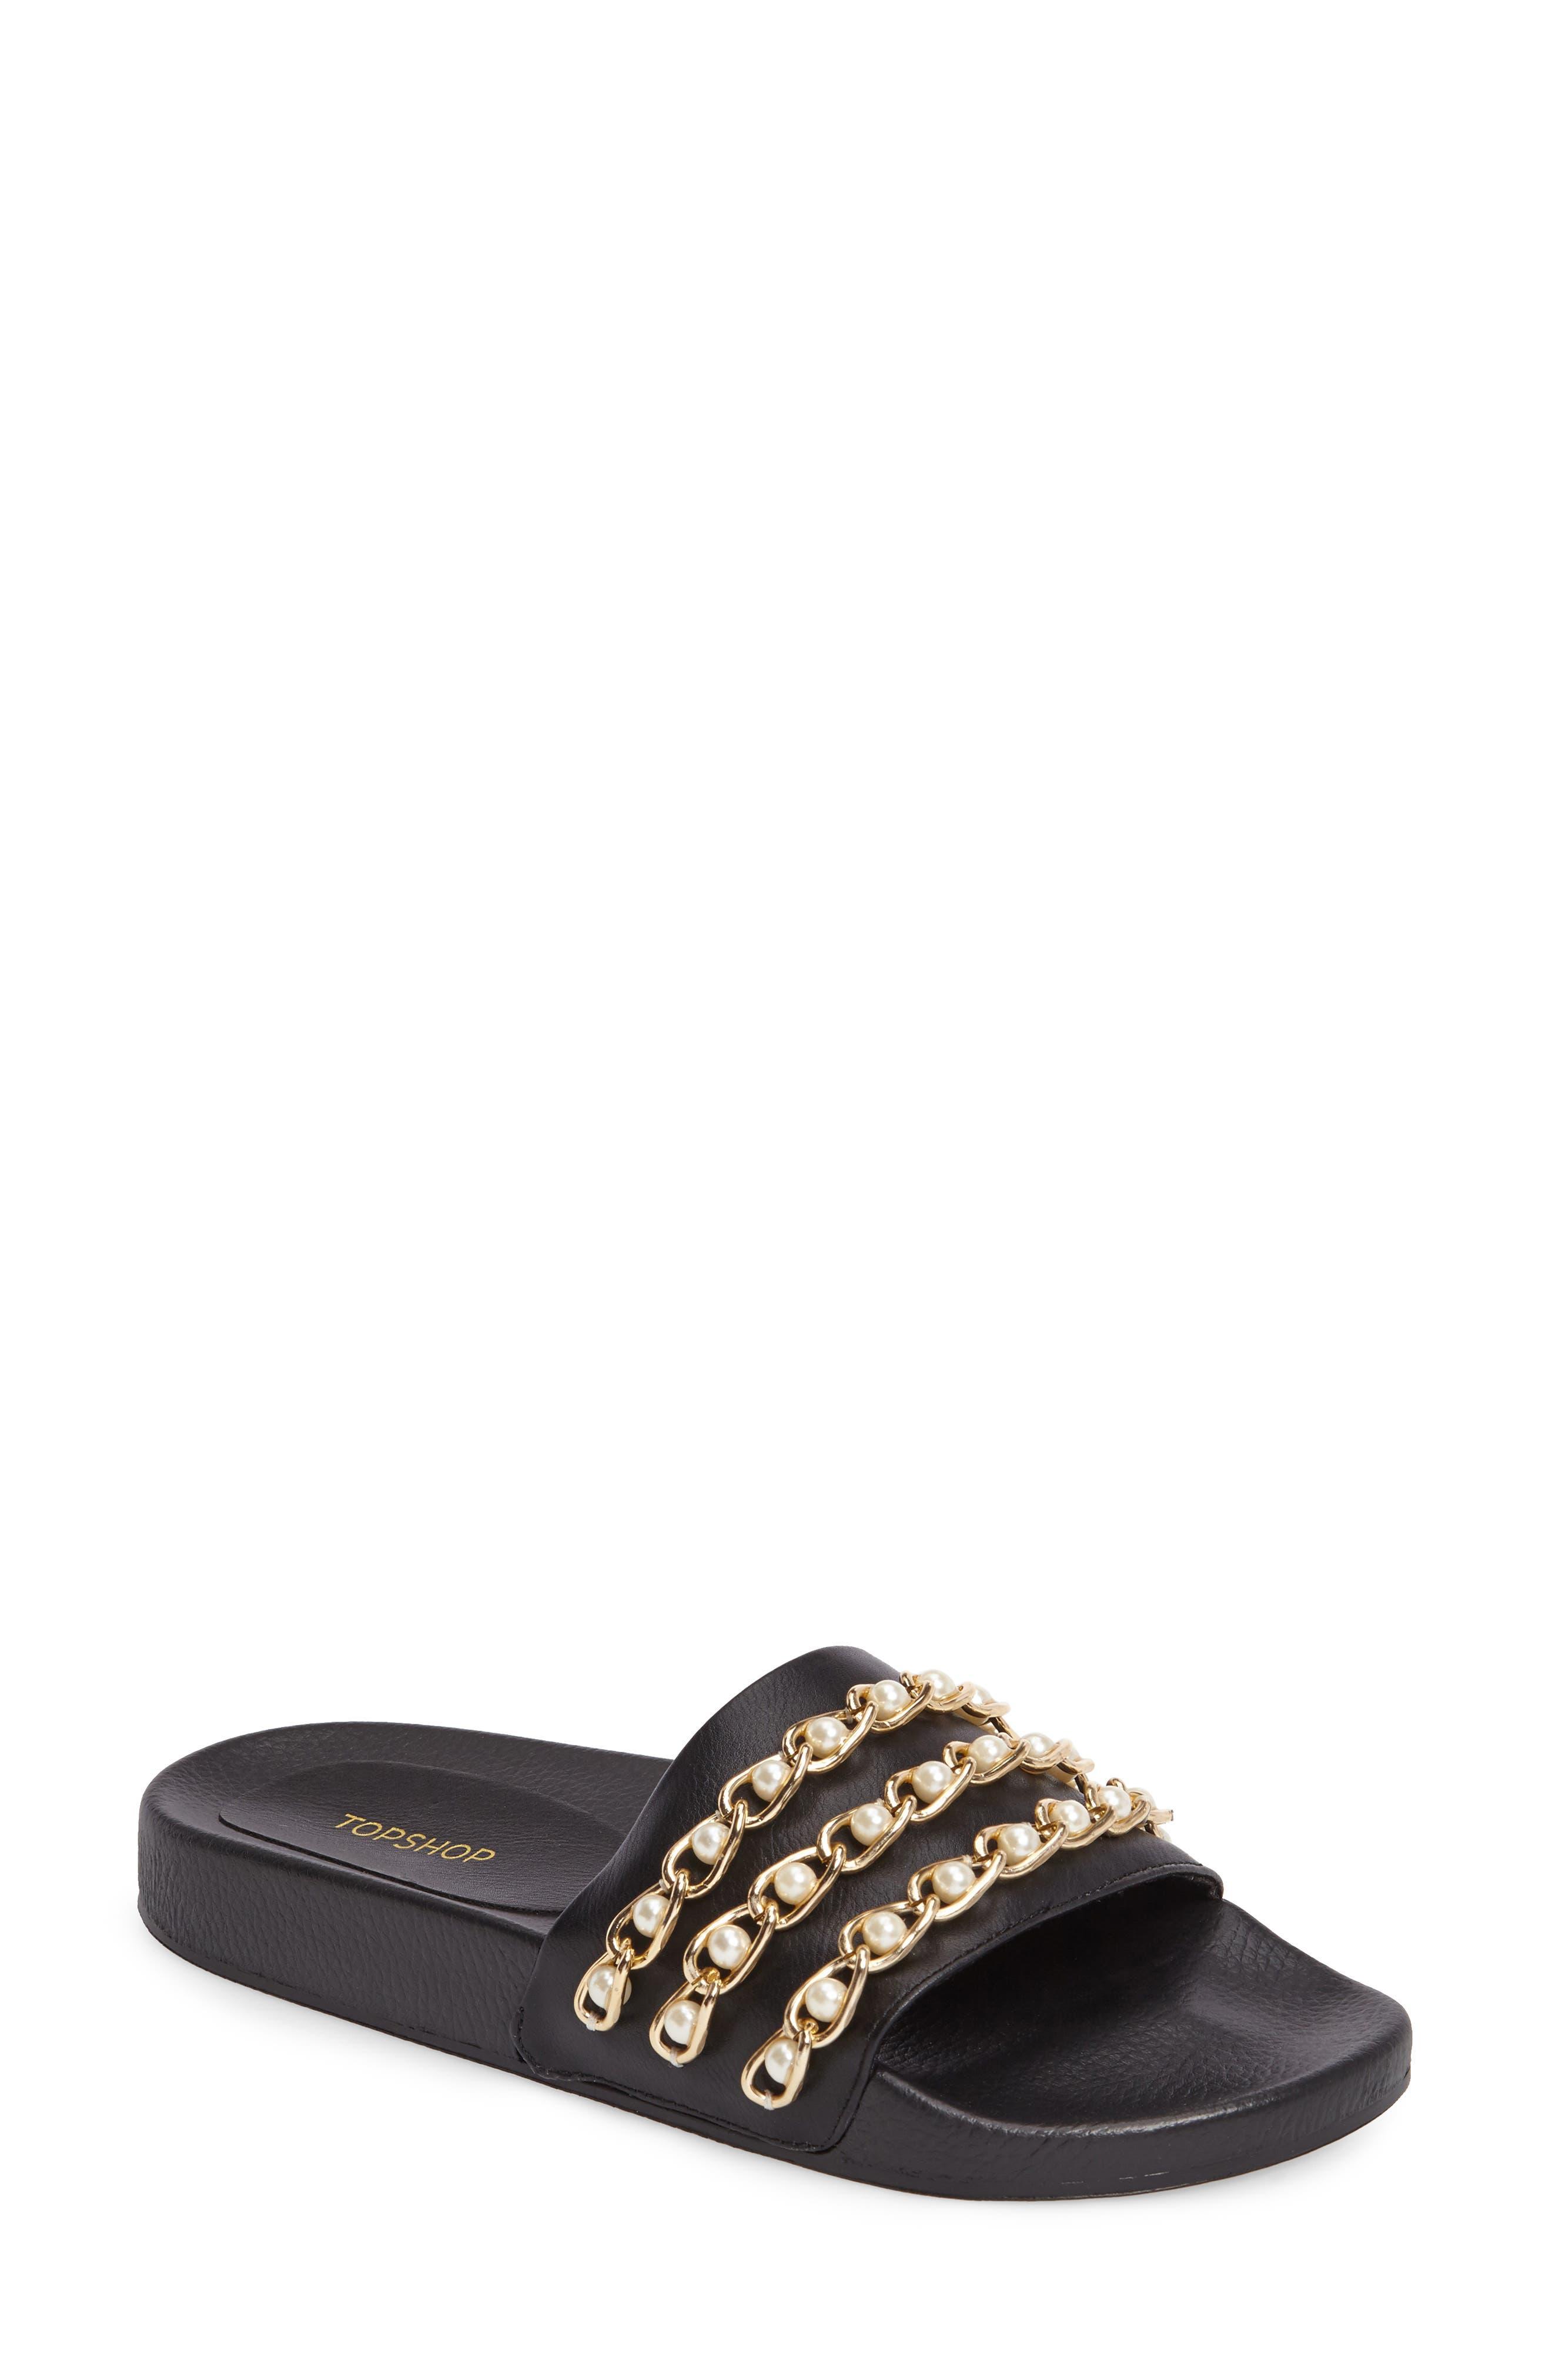 Hottie Pearl Chain Slide Sandal,                         Main,                         color, Black Multi